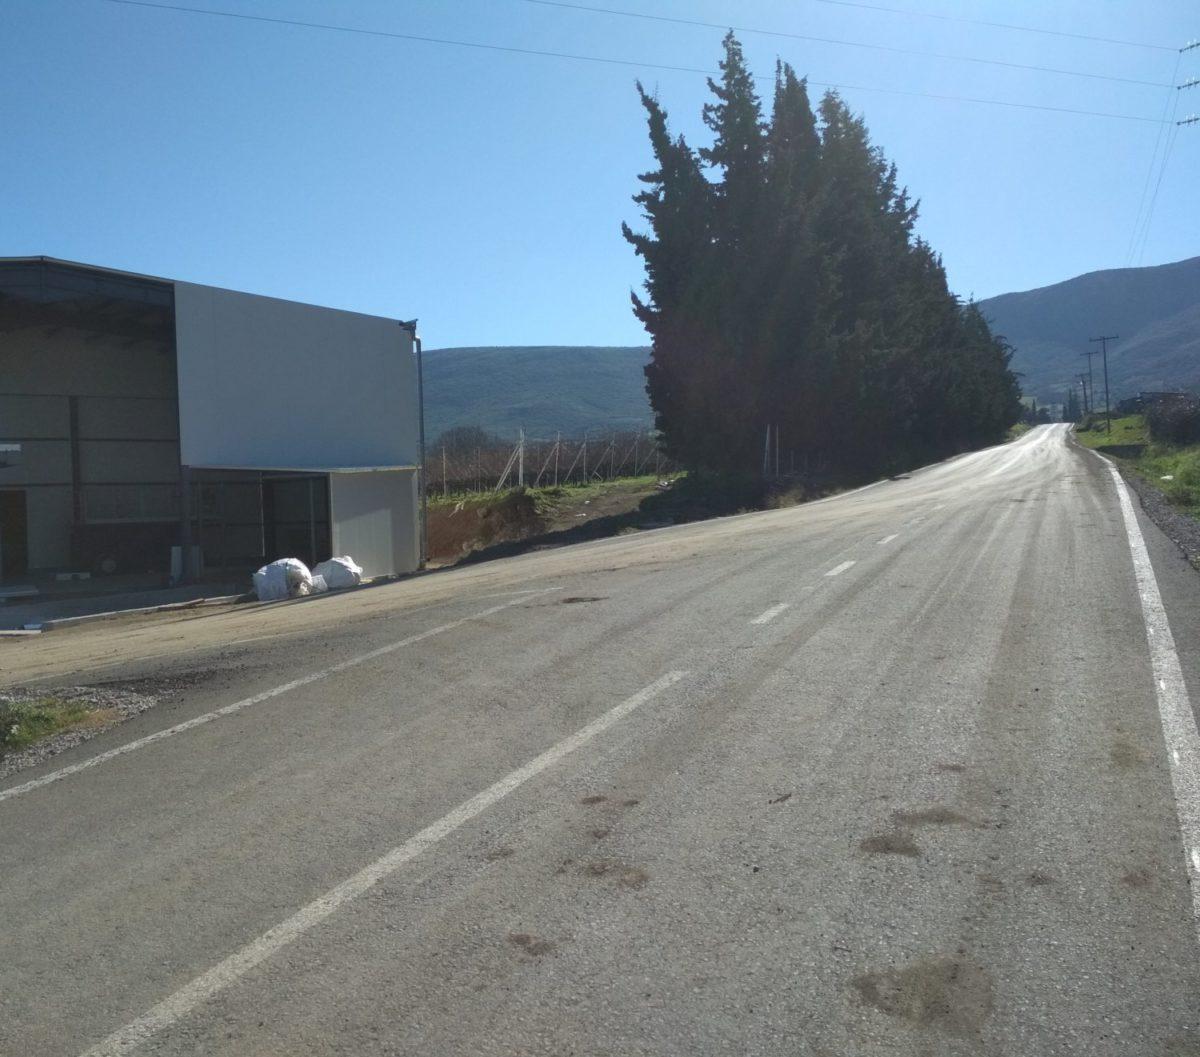 Photo of Ολοκληρώθηκαν οι εργασίες βελτίωσης της συνδετήριας οδού Διλόφου – Φαρσάλων